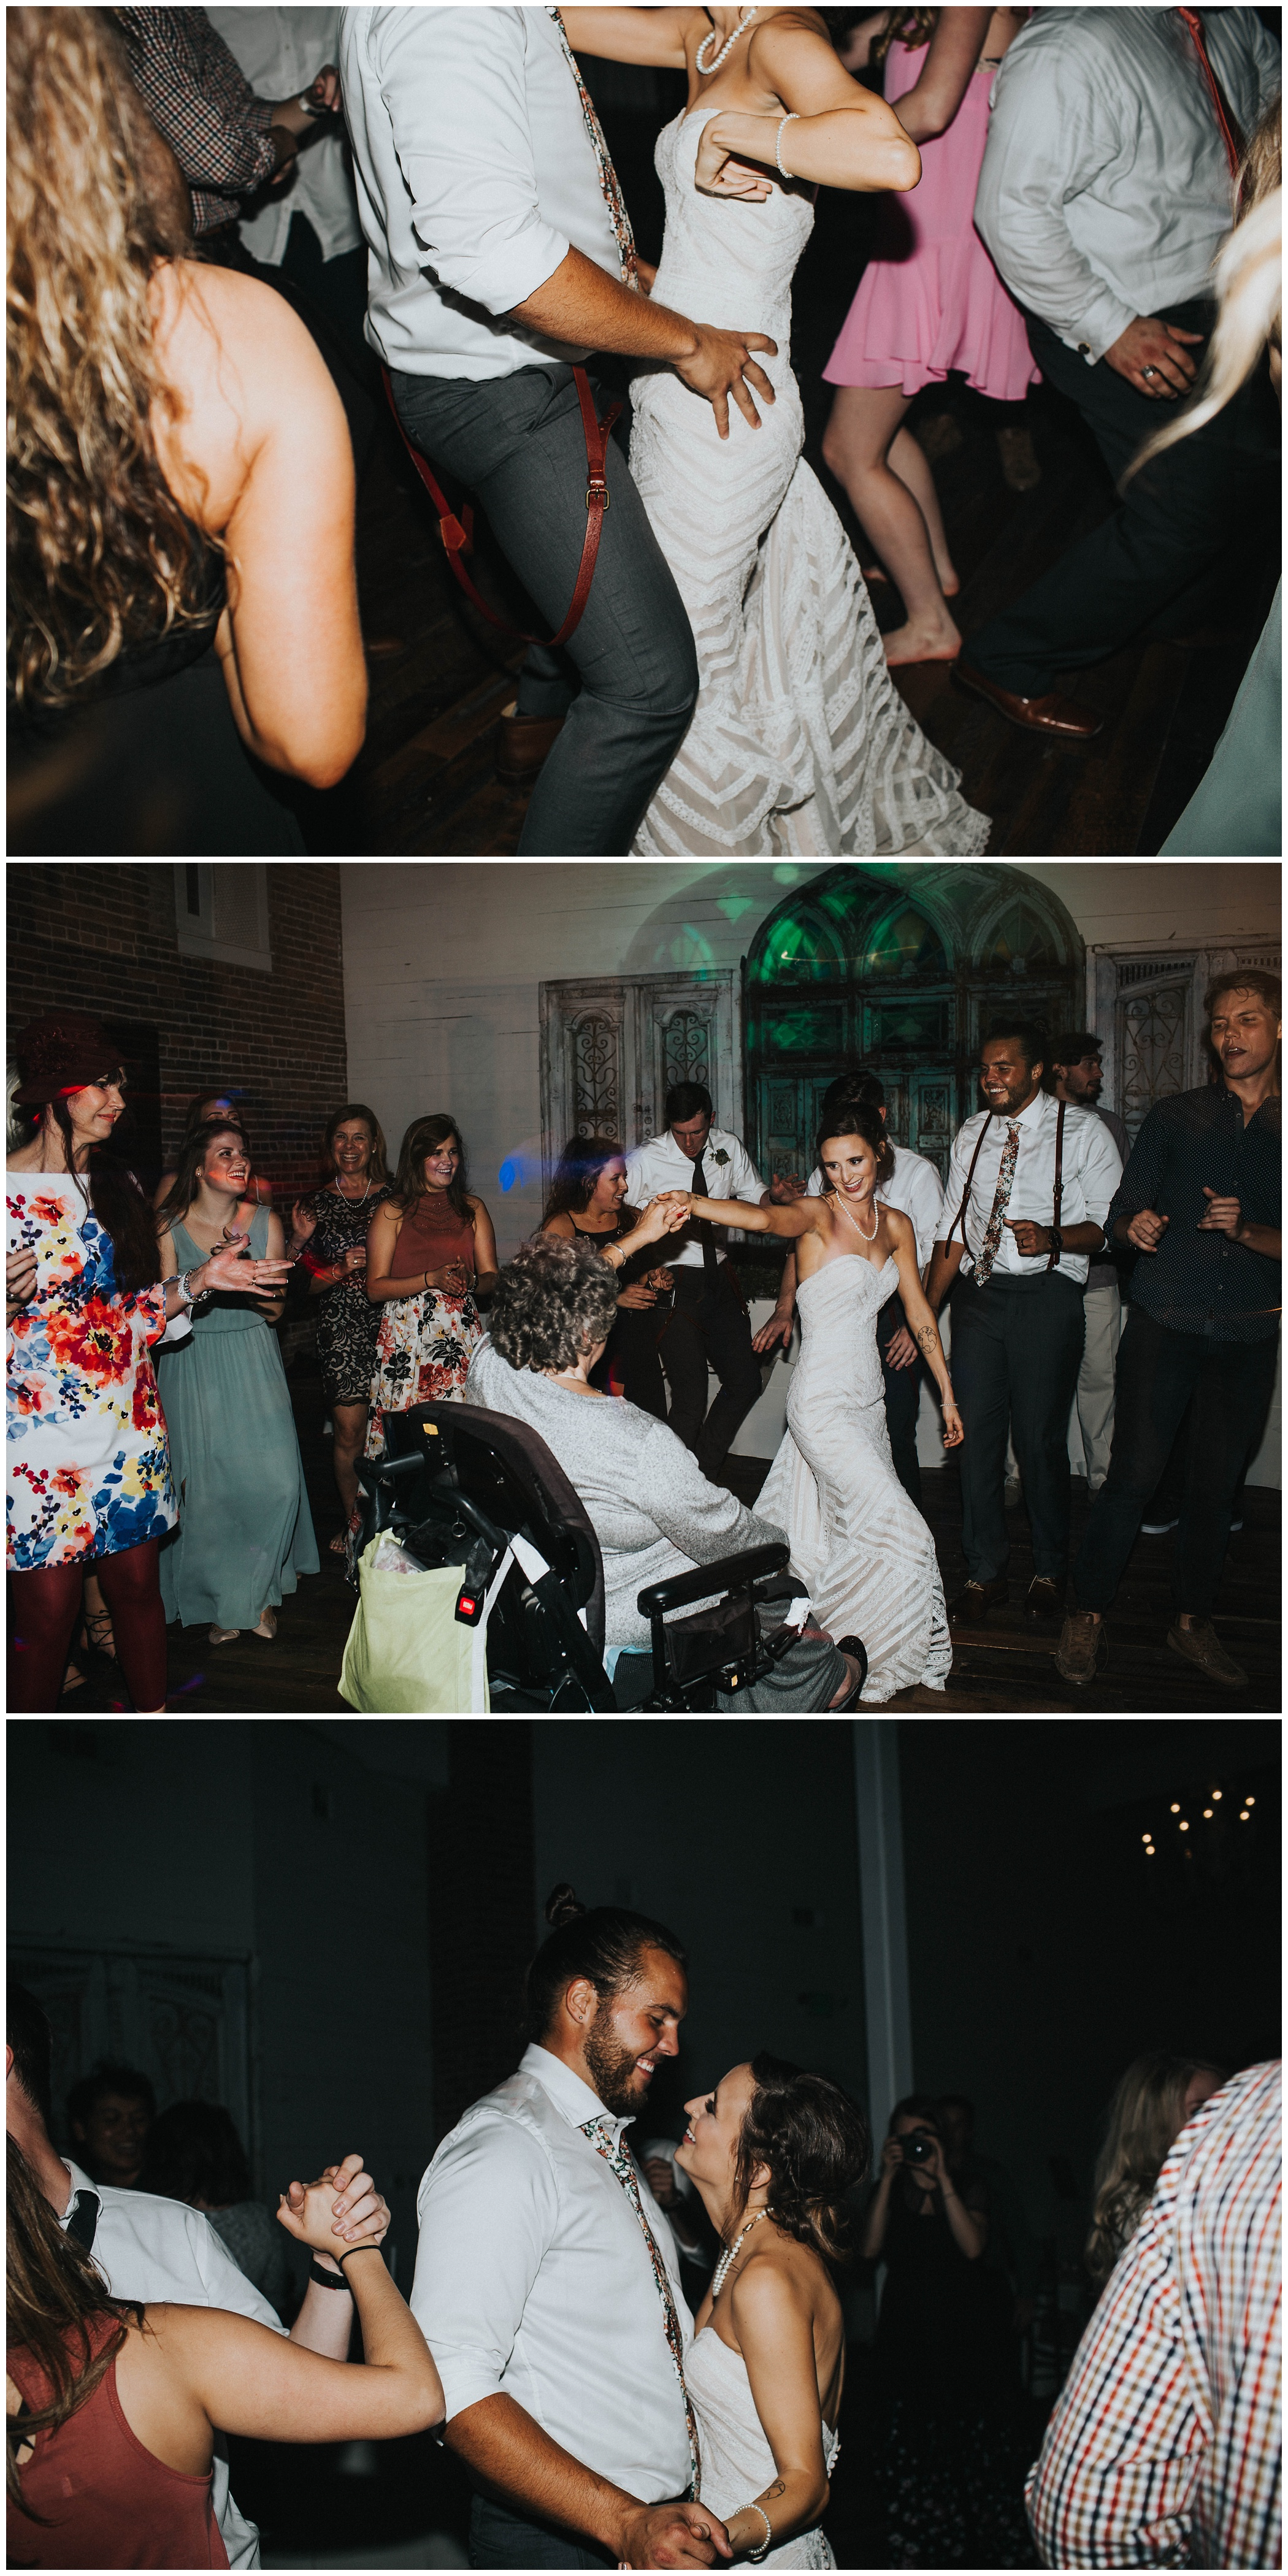 ravington, reception, the, ravington, centerson, northwest, arkansas, johnsons, photo, wedding, photography